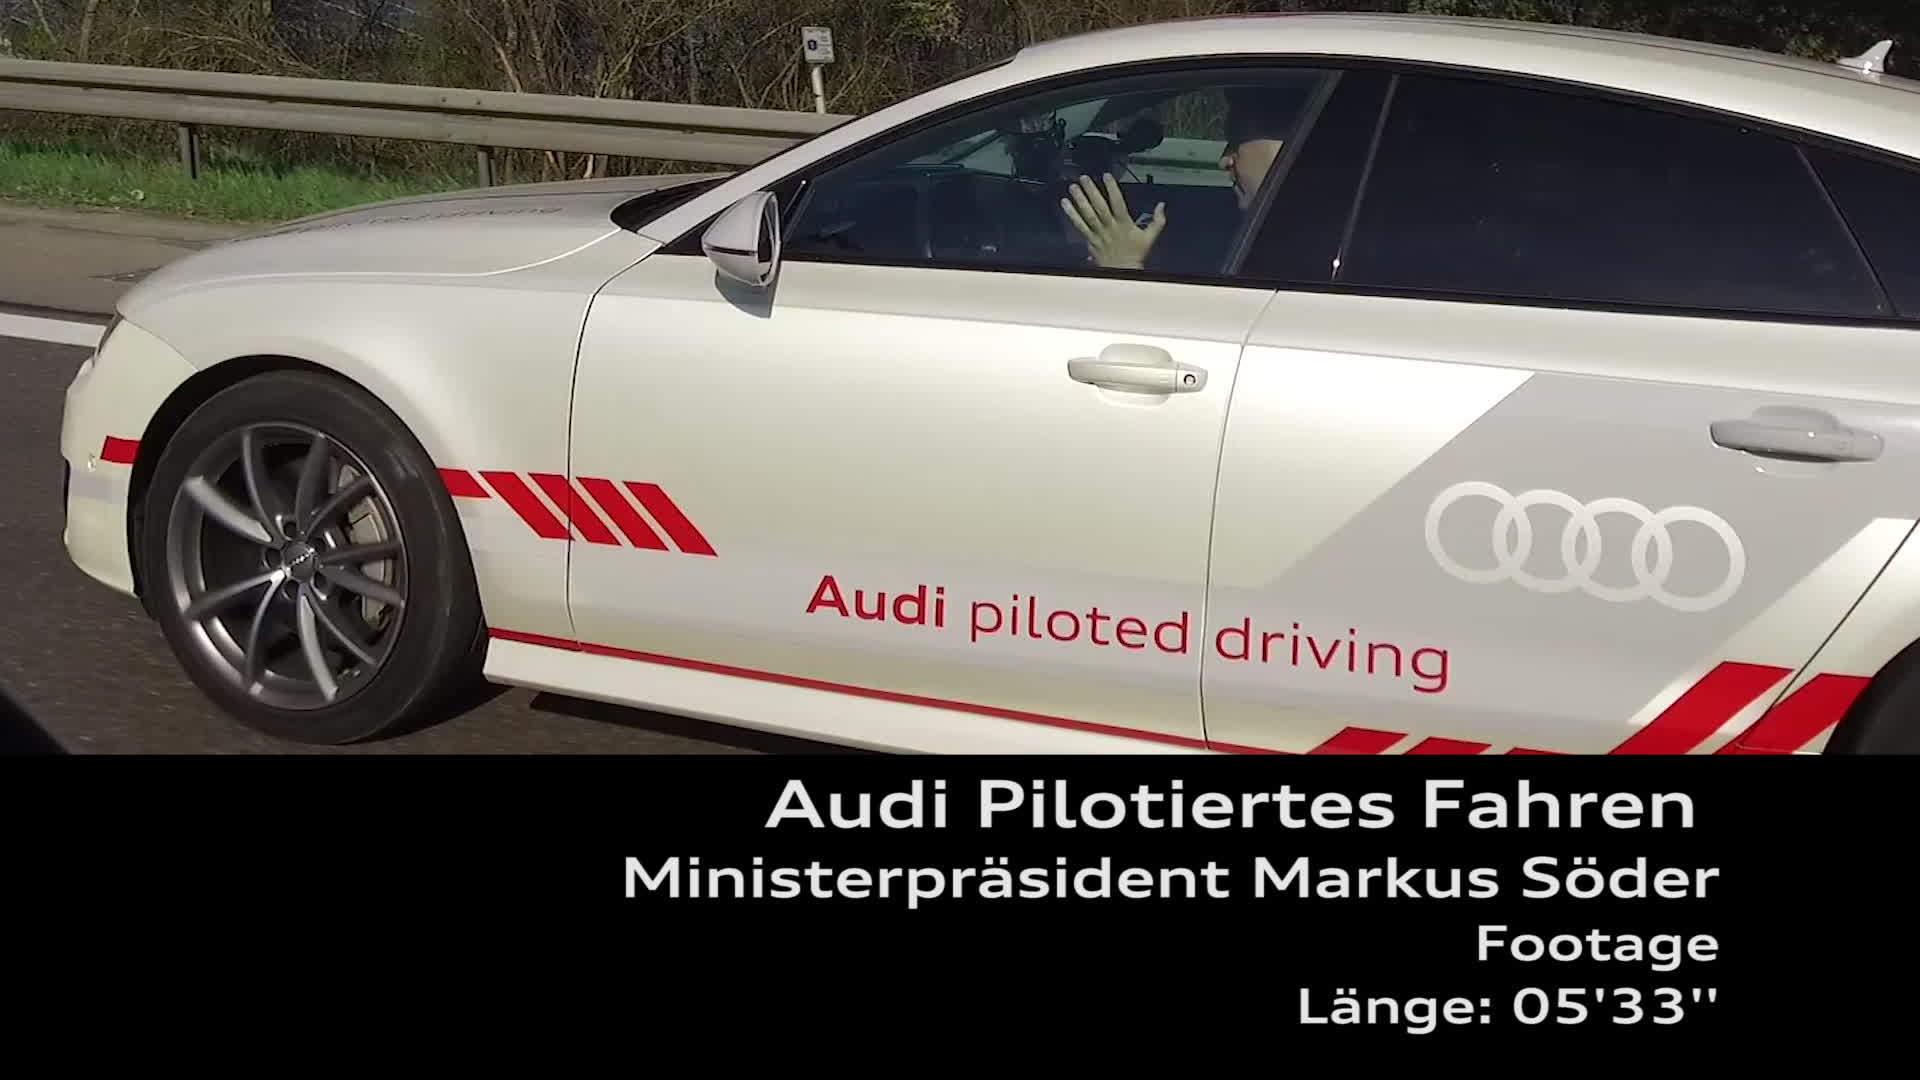 Audi Pilotiertes Fahren mit Ministerpräsident Markus Söder